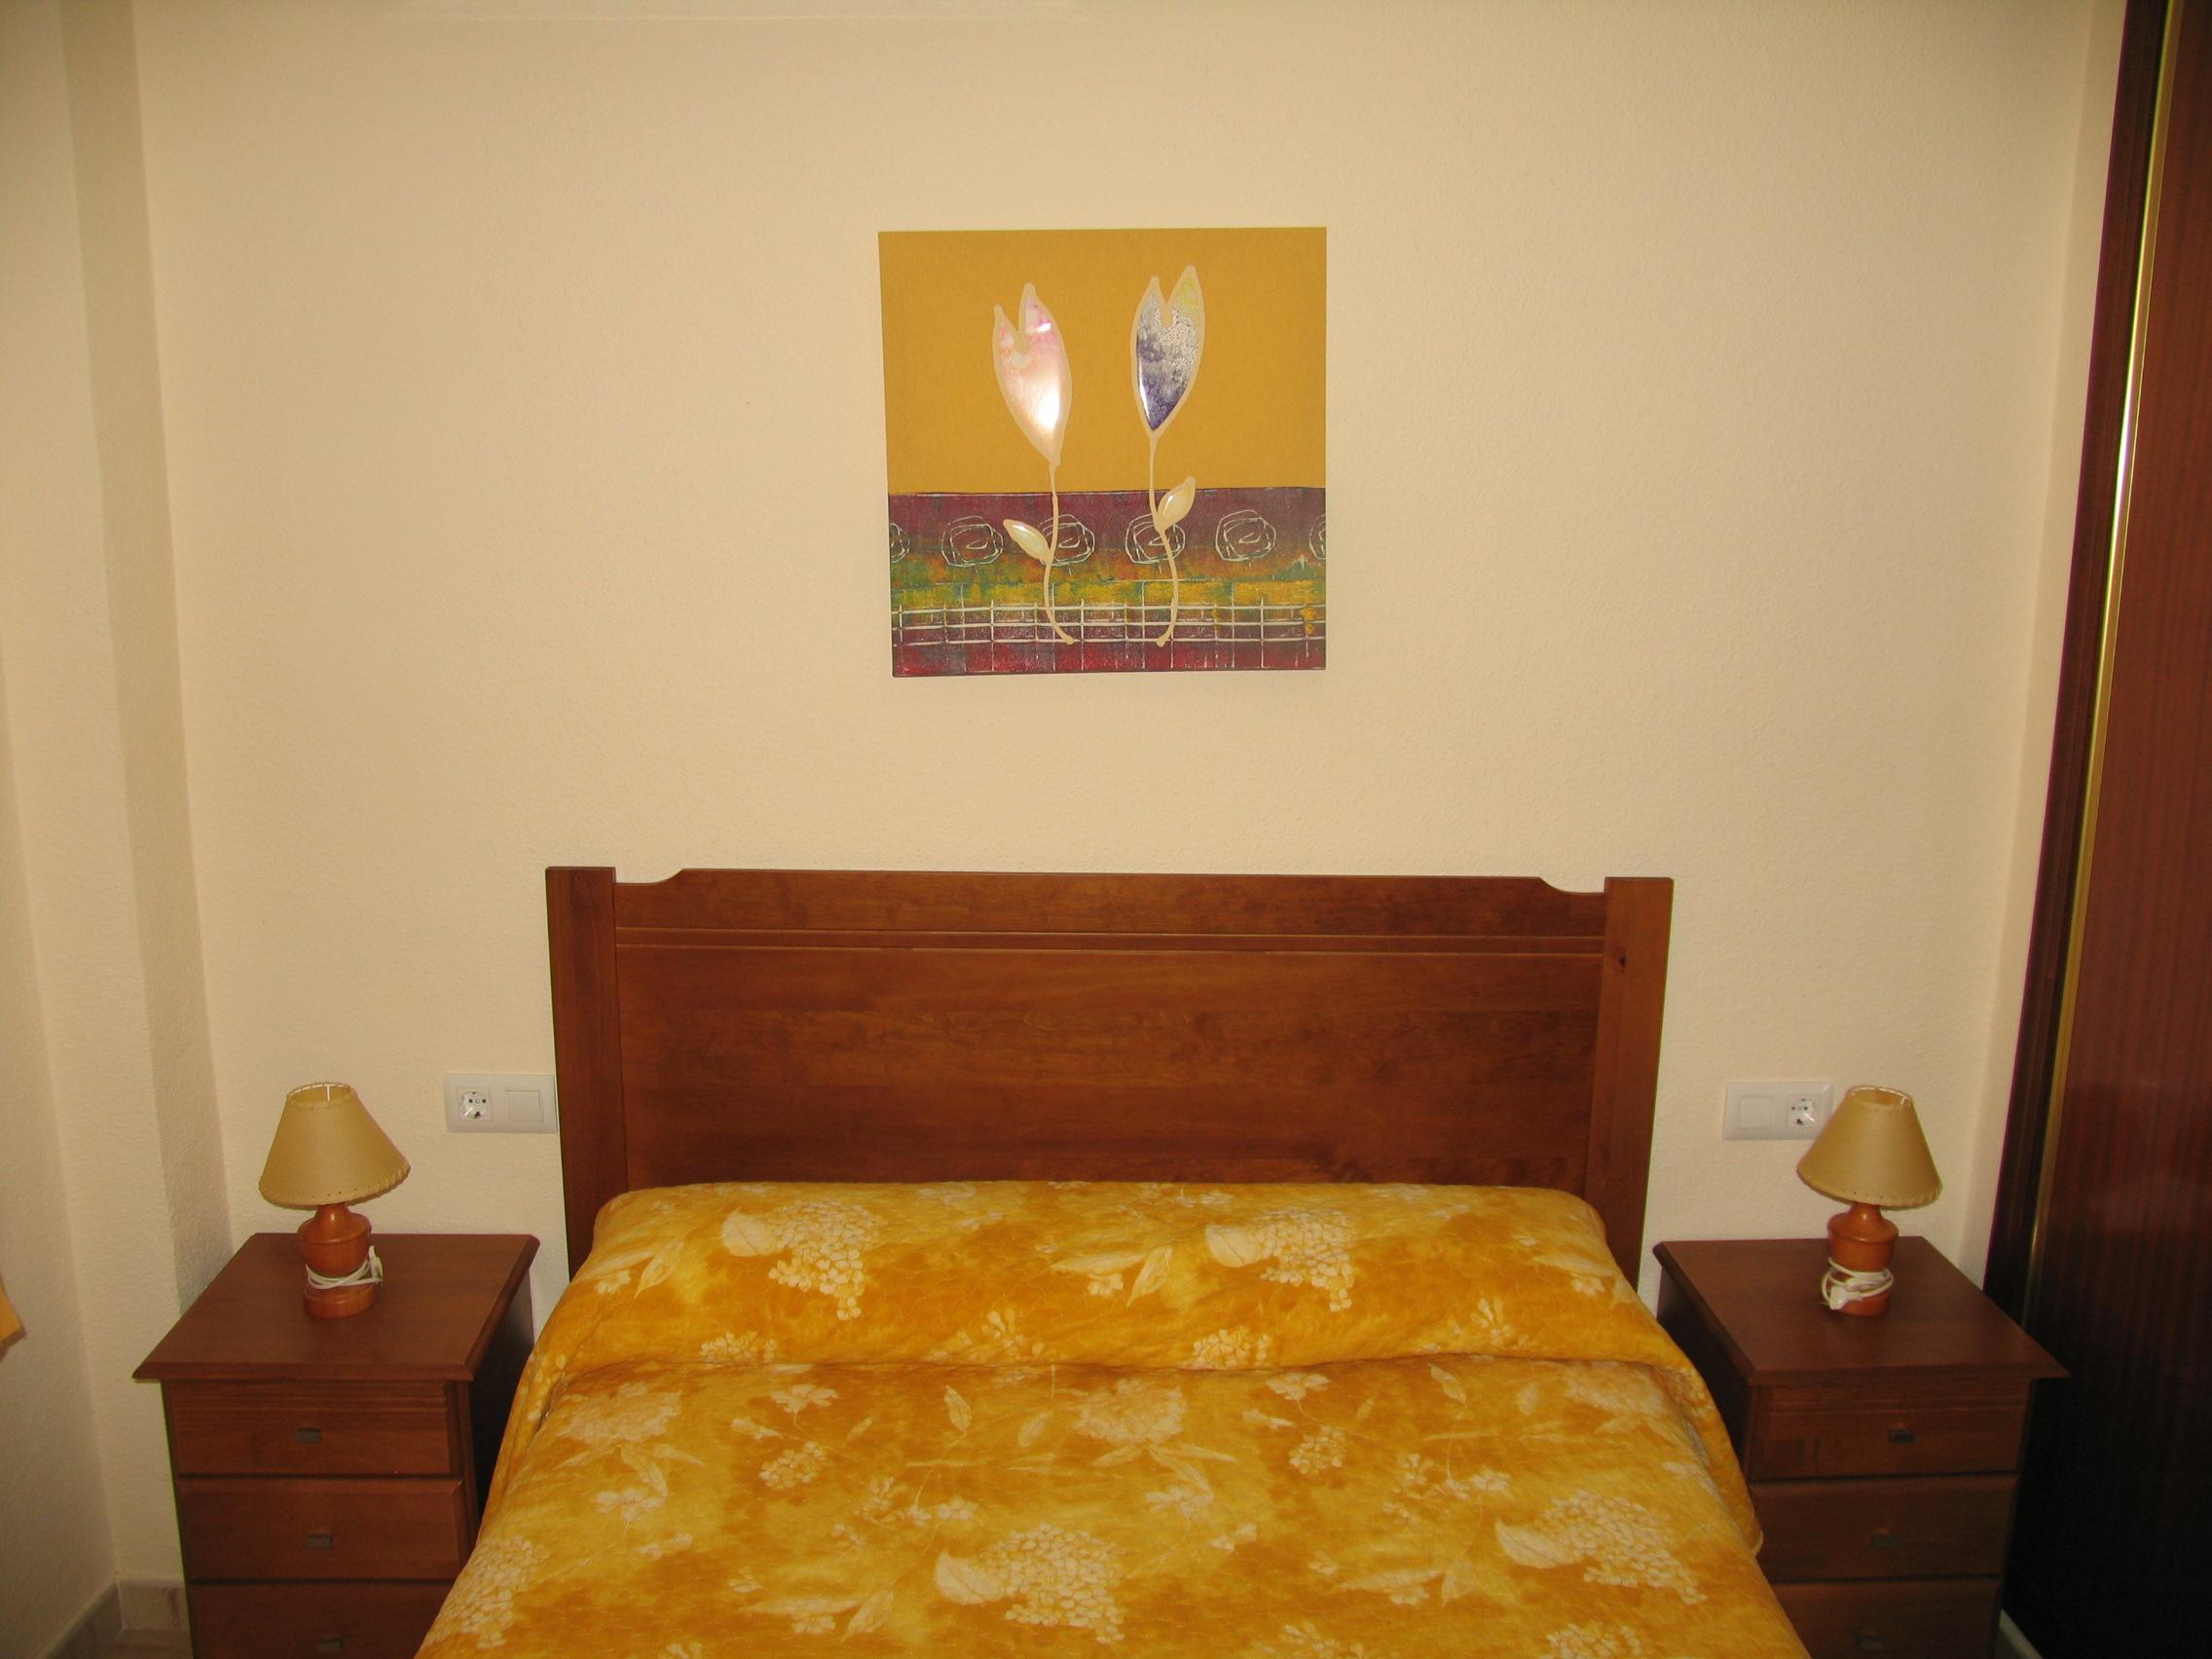 4_tesy_II_dormitorio_principal_blq_5.JPG